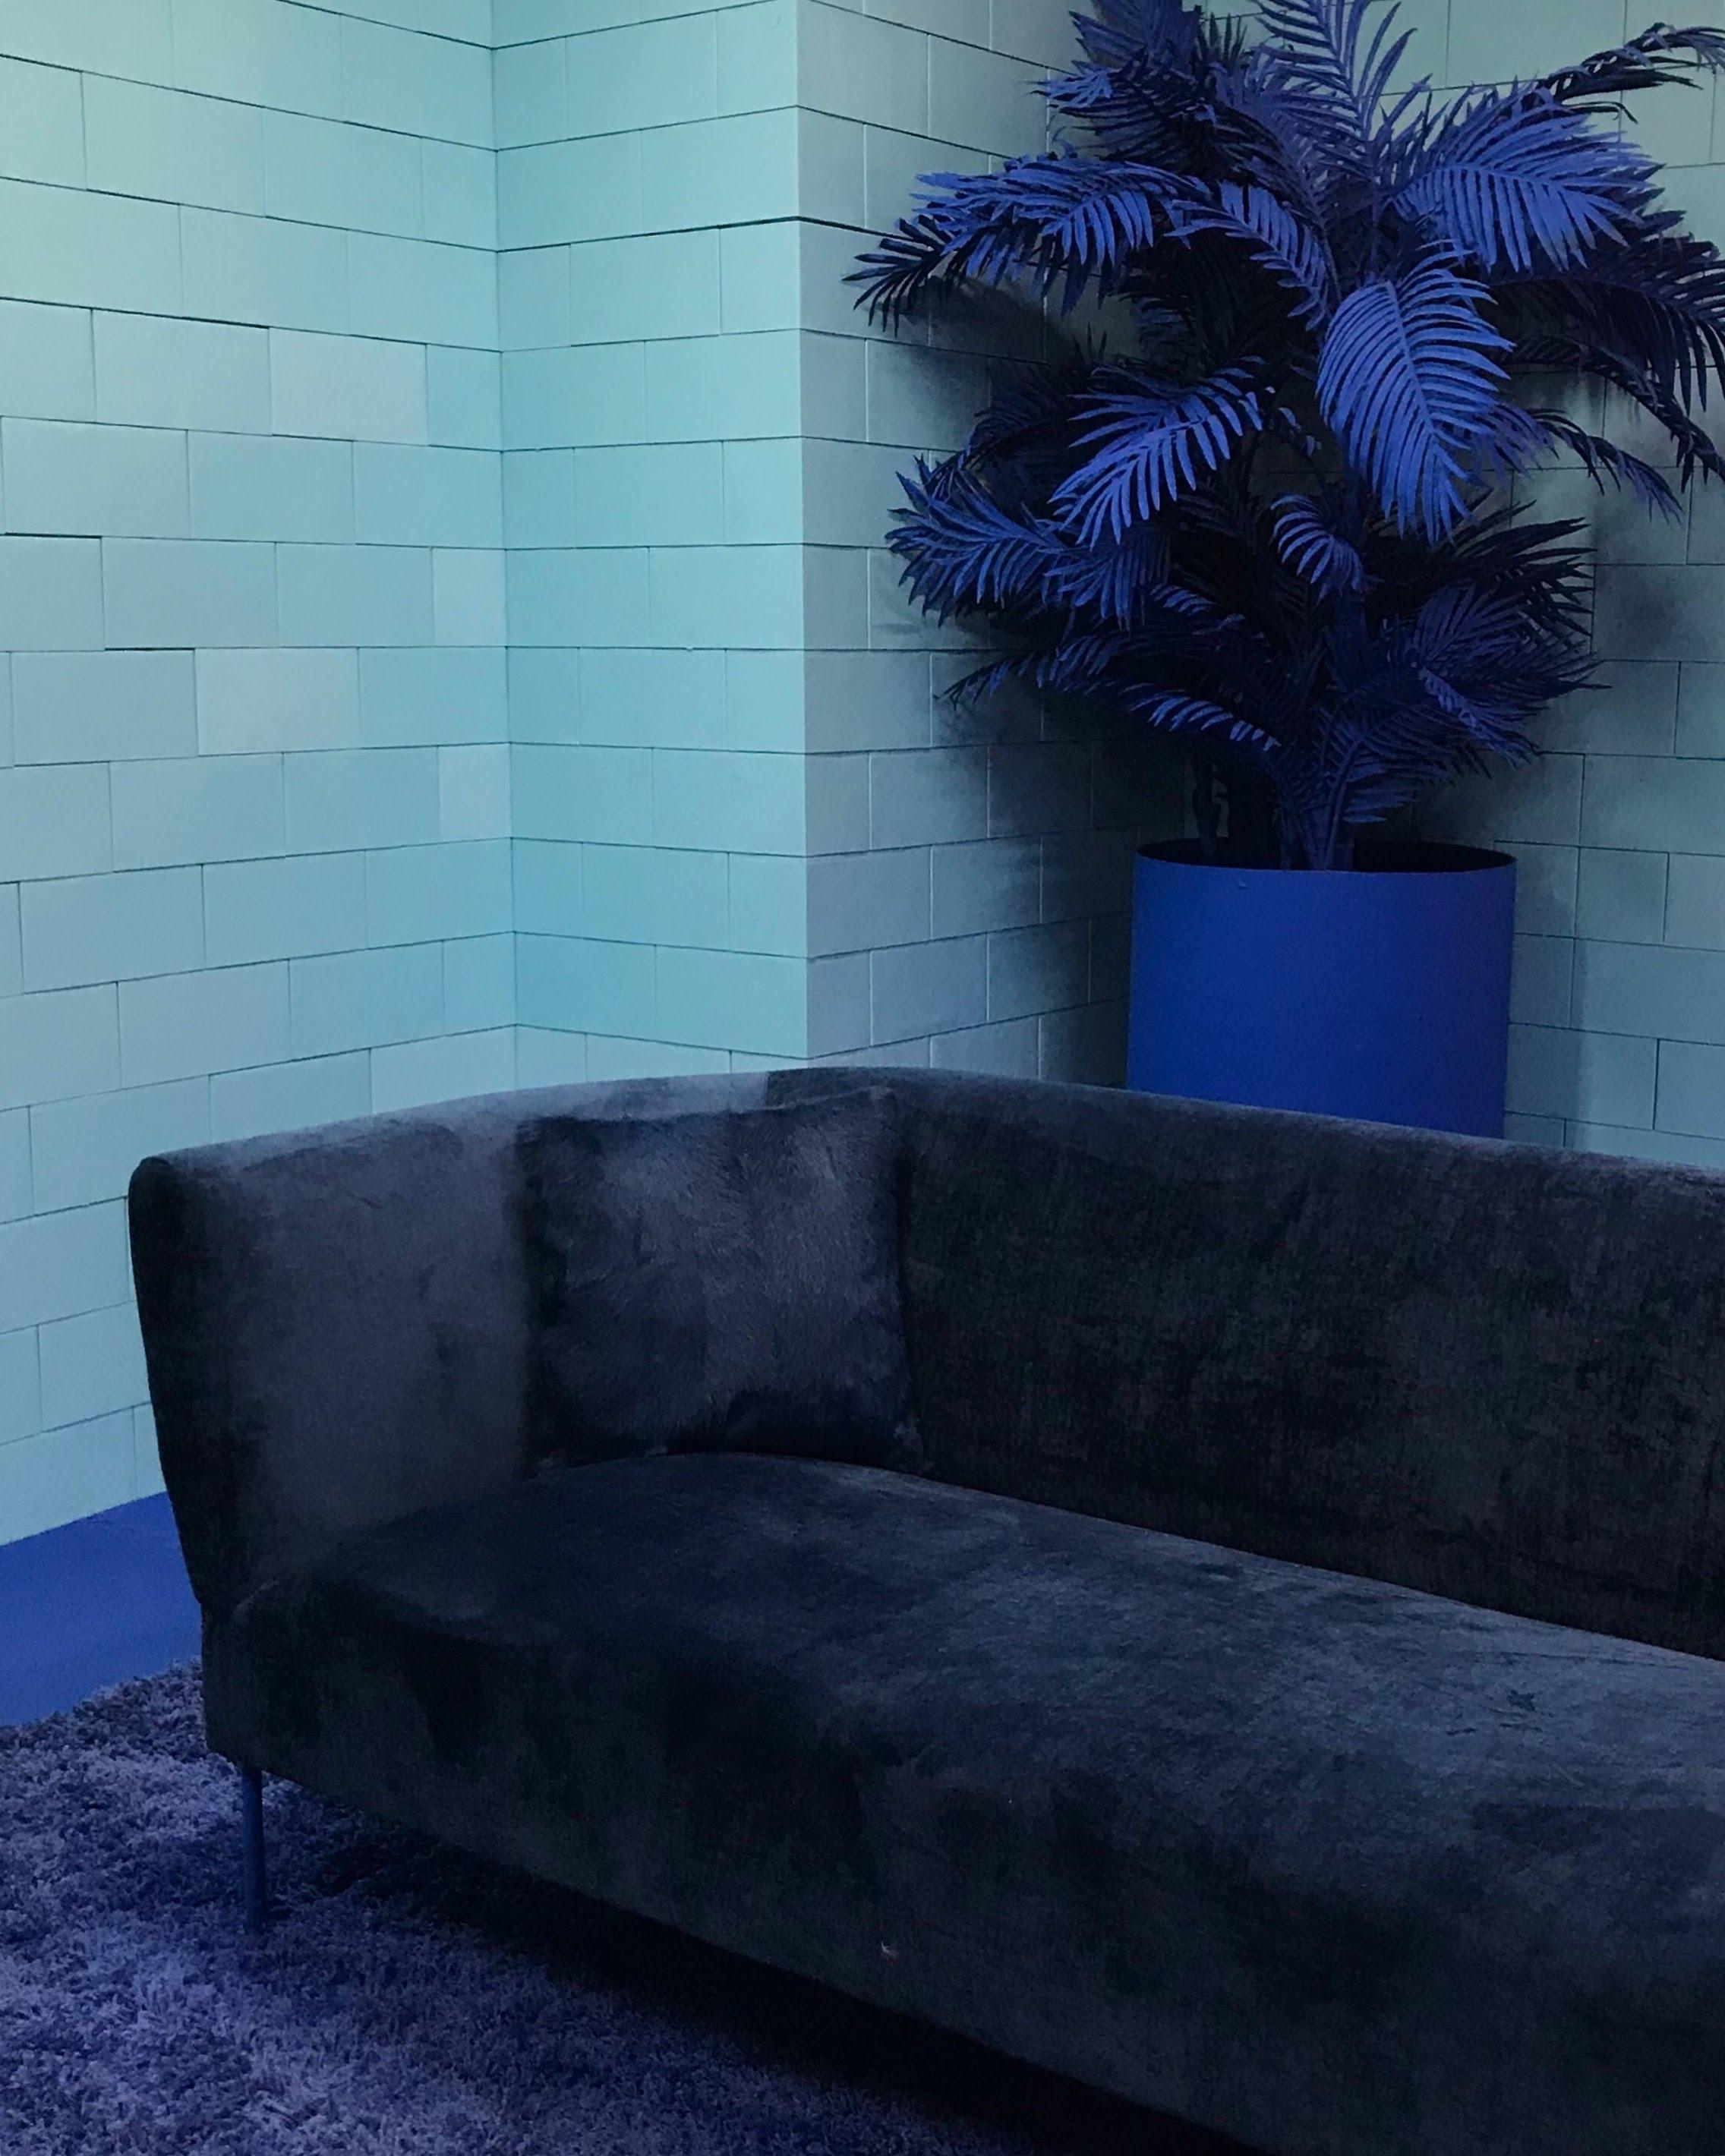 CJ-HENDRY-MONOCHROME-BLUE